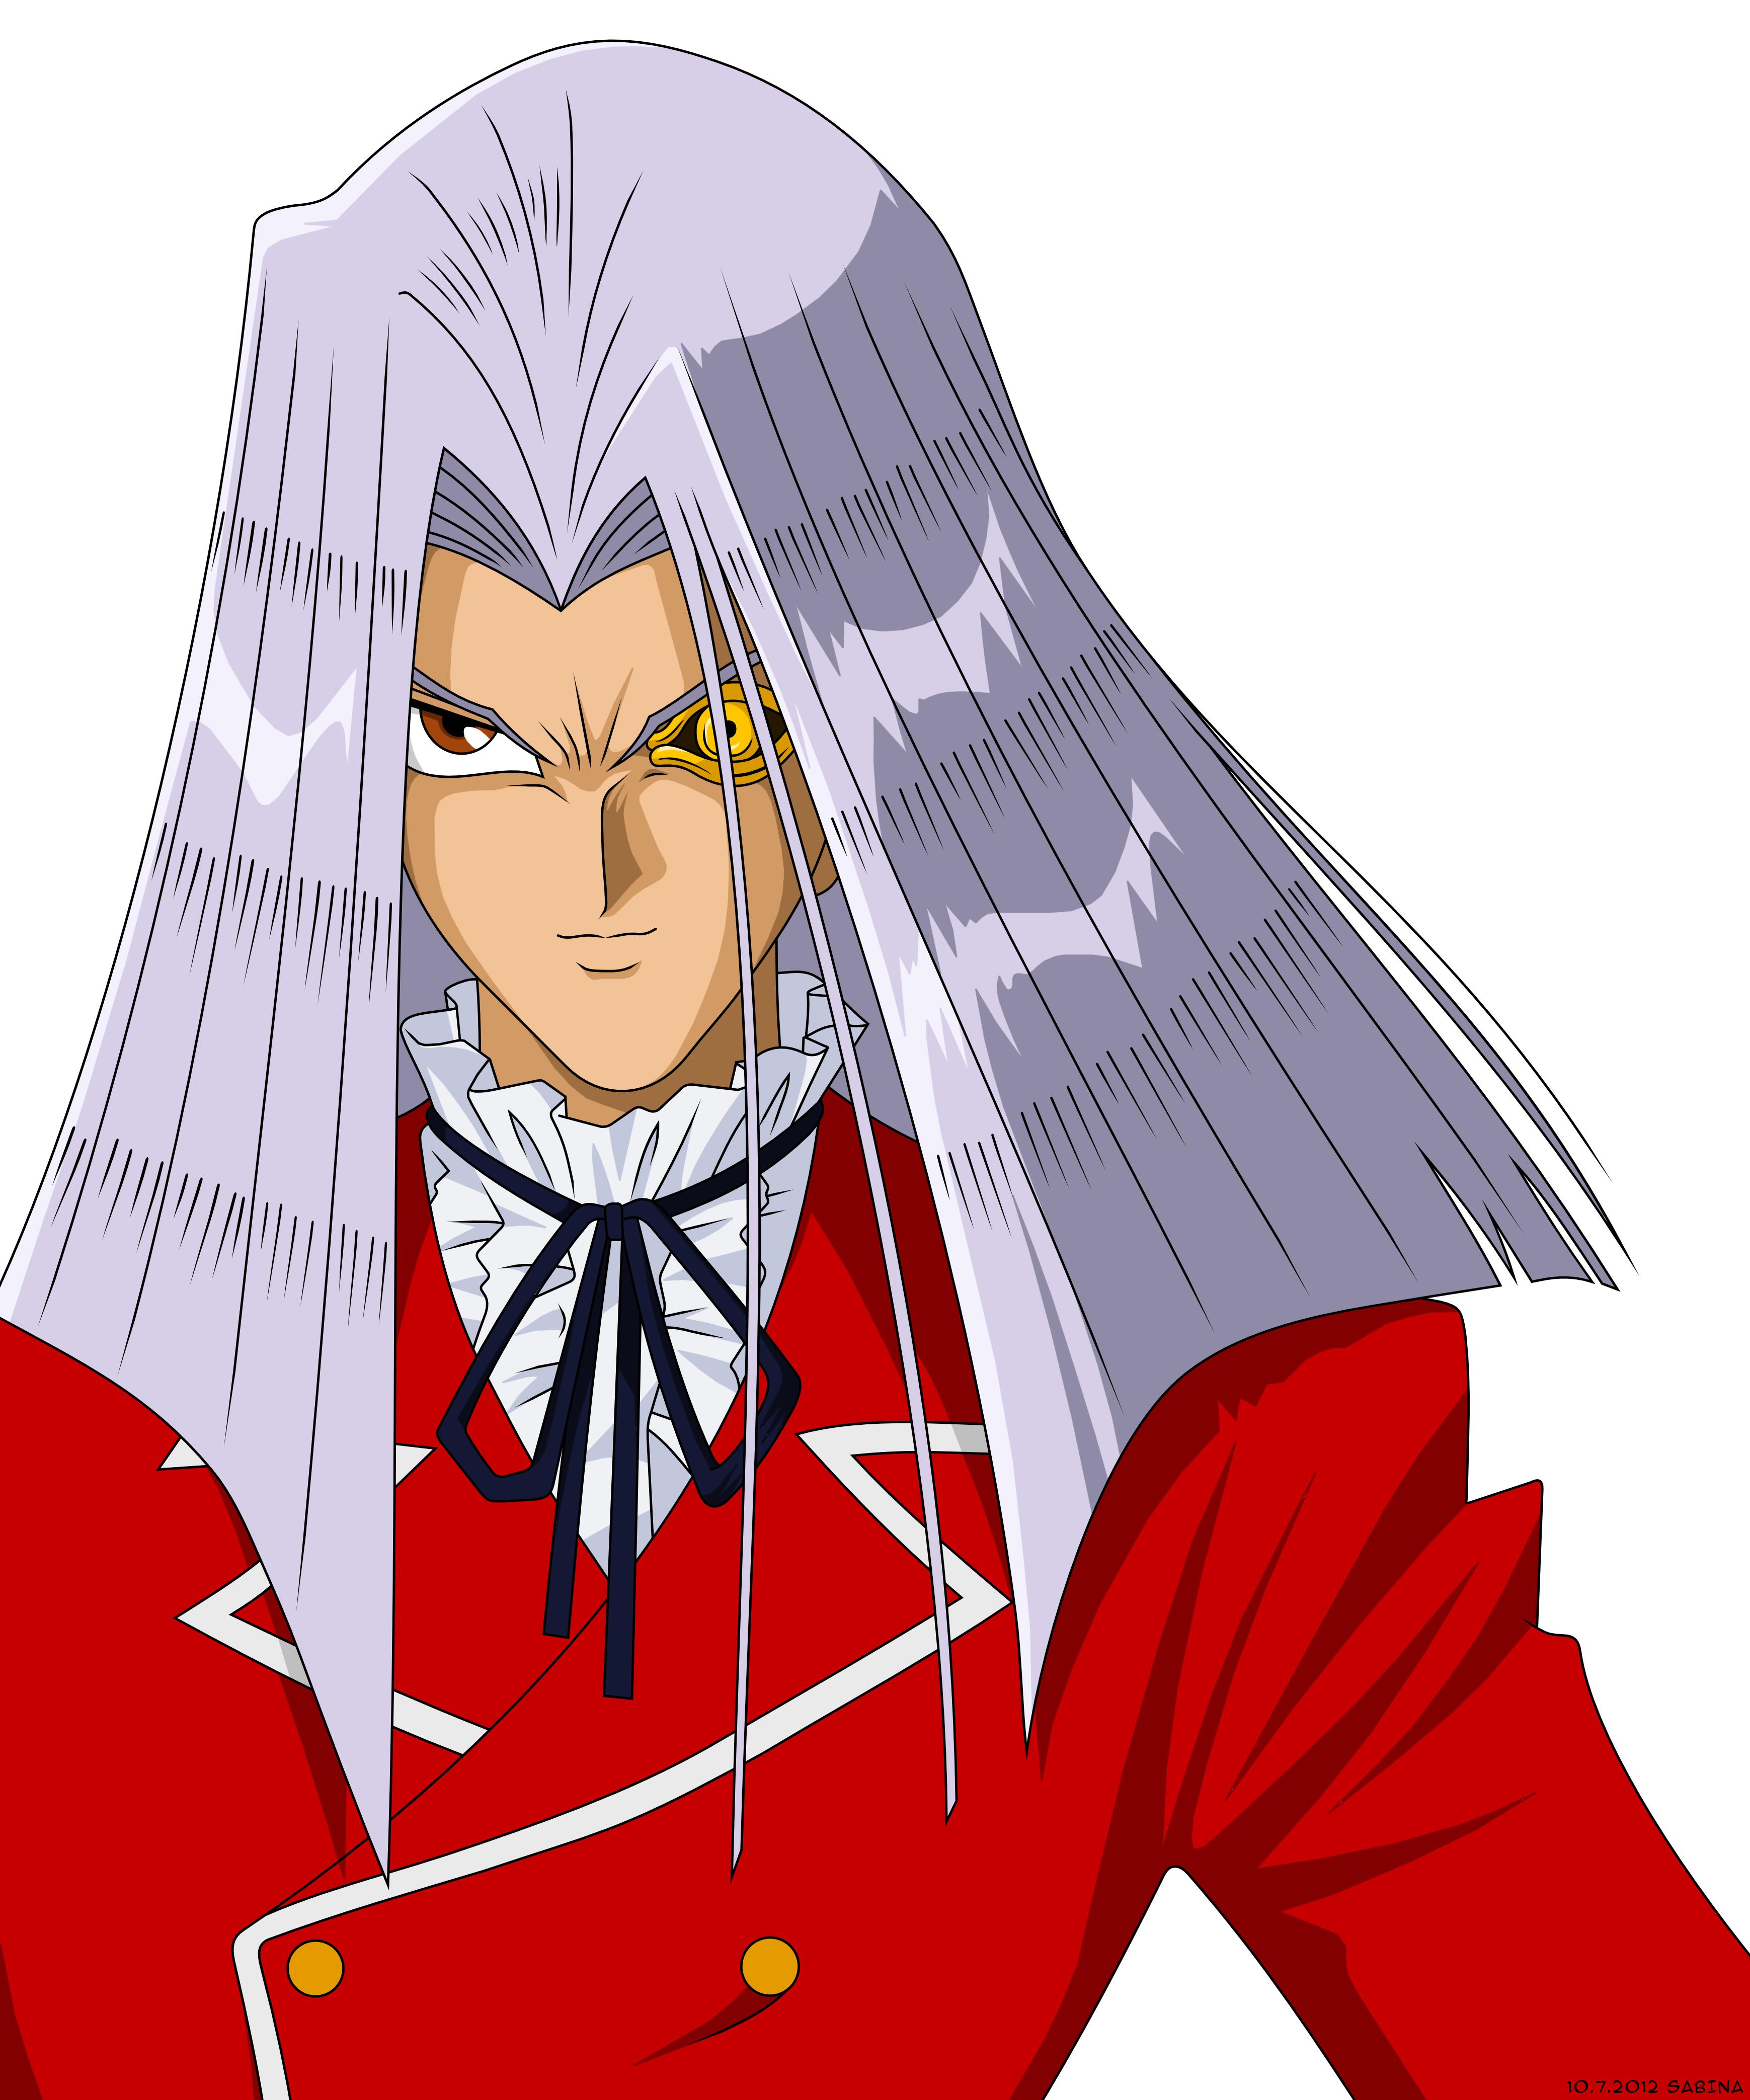 Pegasus J Crawford Yu Gi Oh Duel Monsters Image 2046692